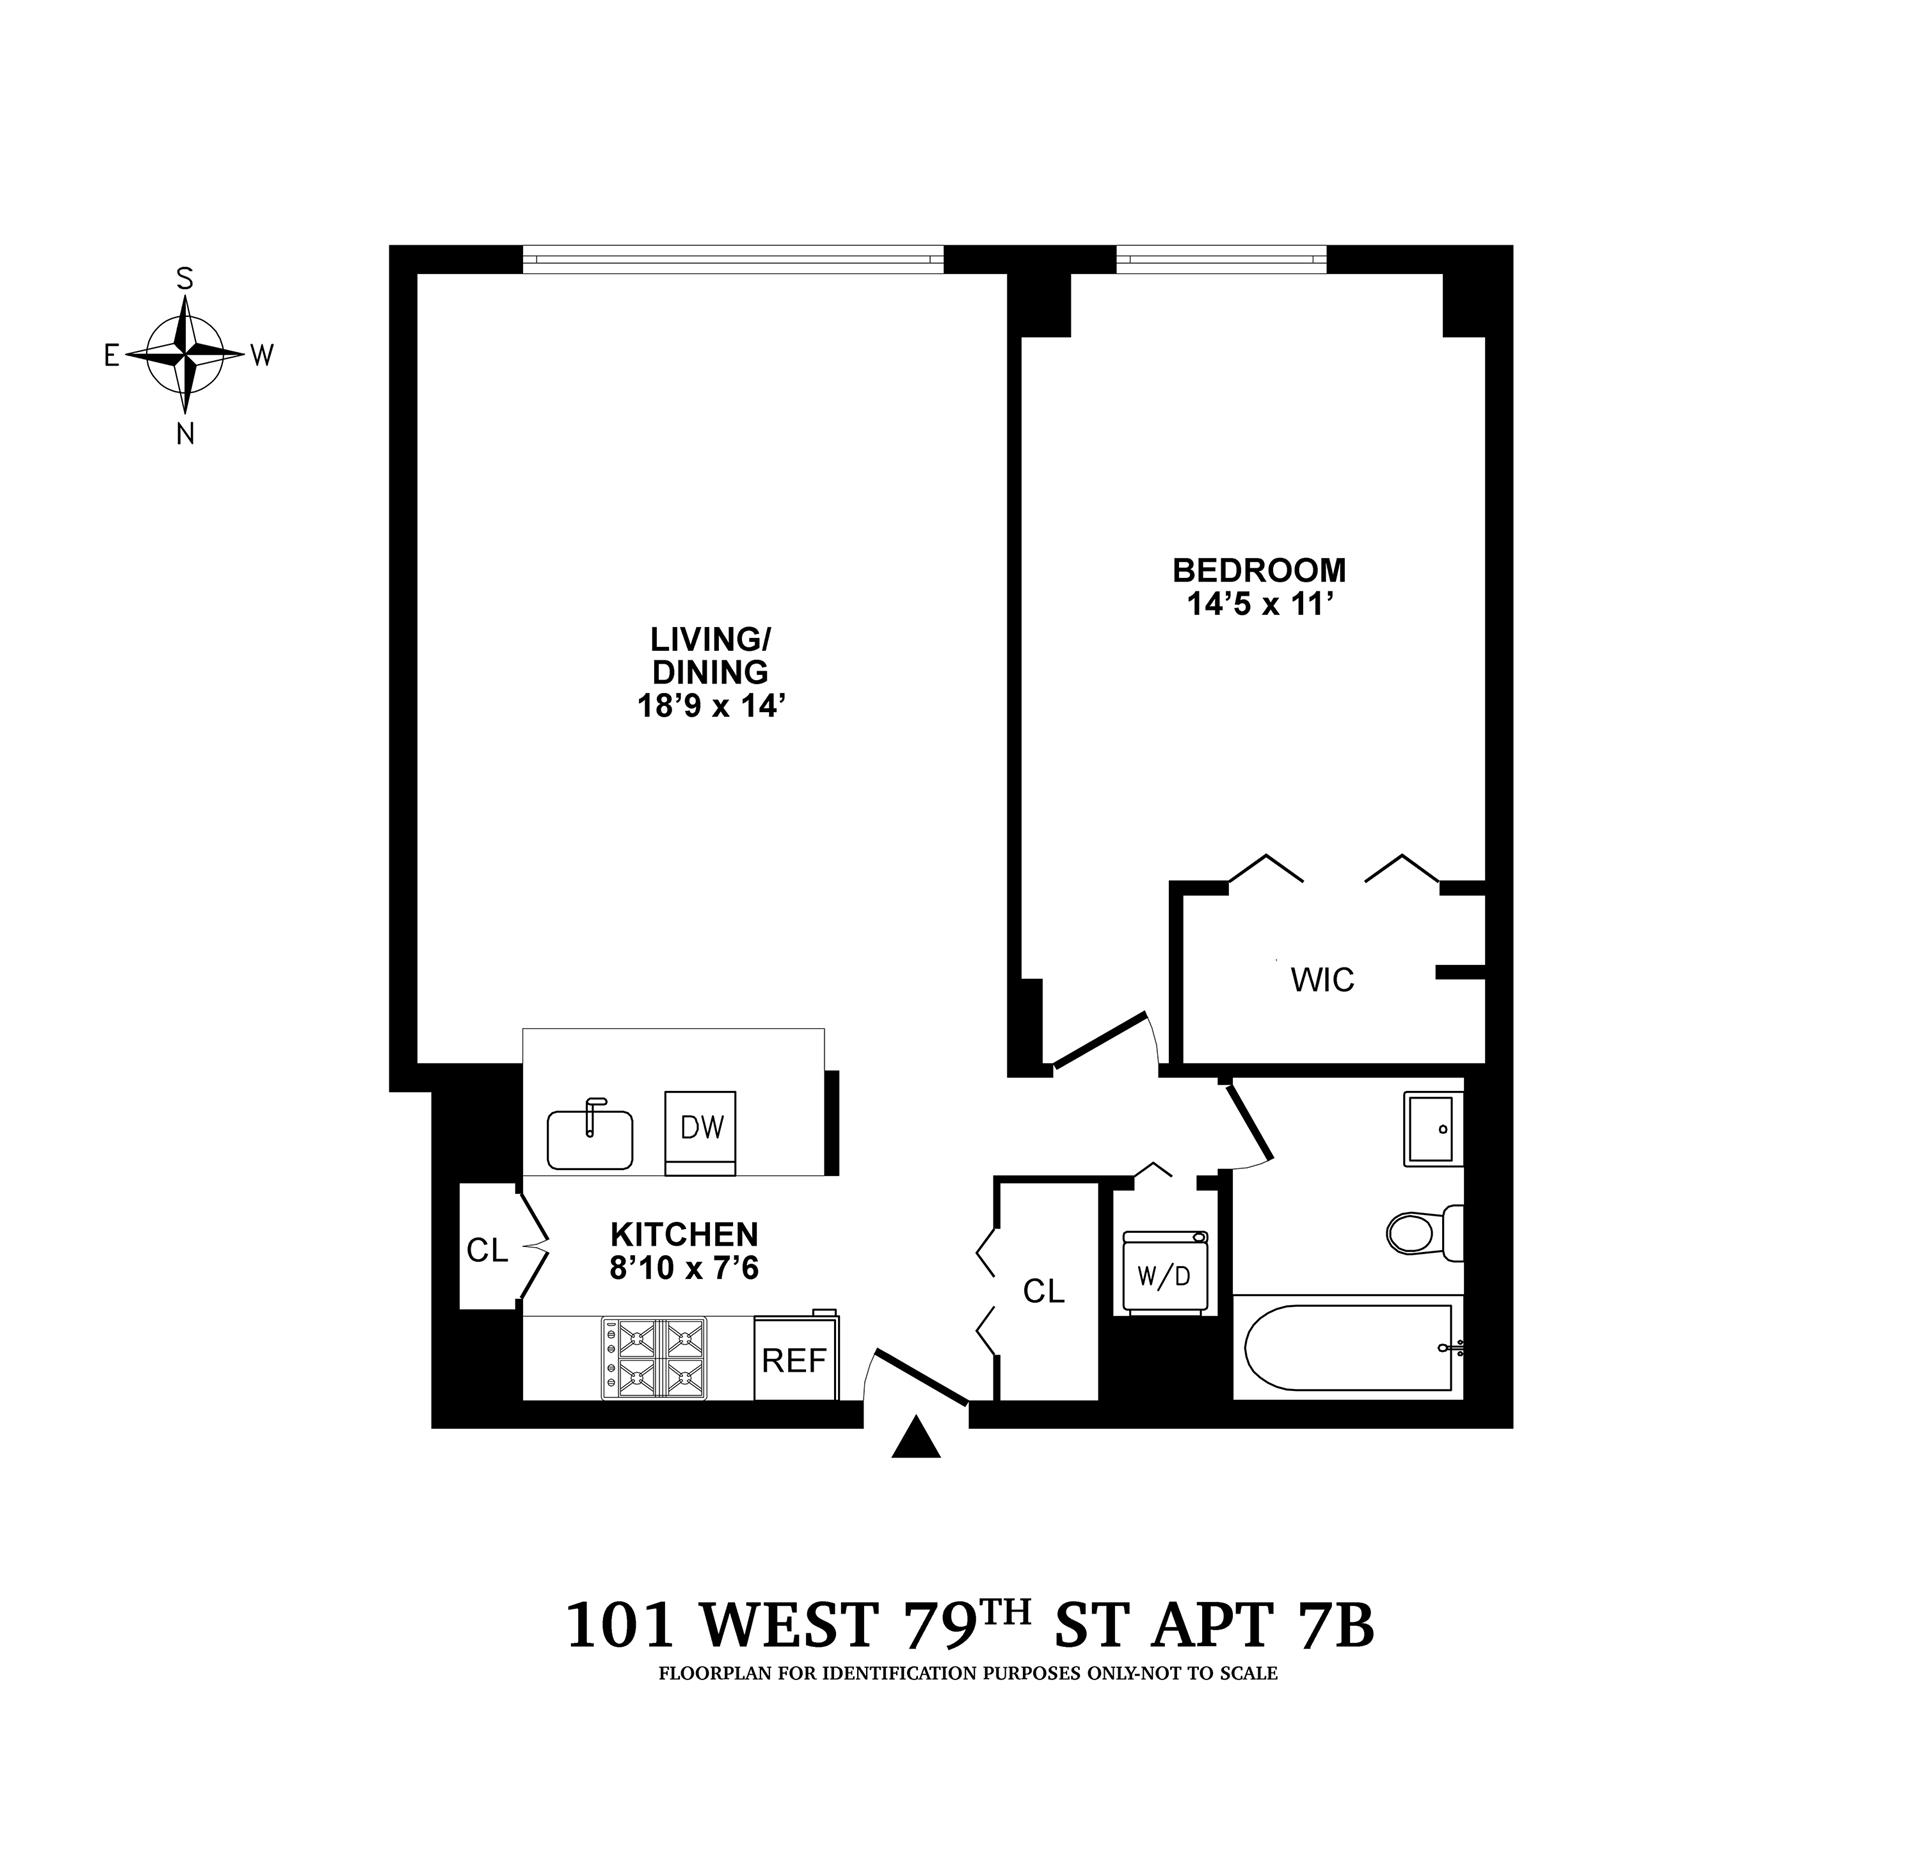 Floor plan of 101 West 79th Street, 7B - Upper West Side, New York